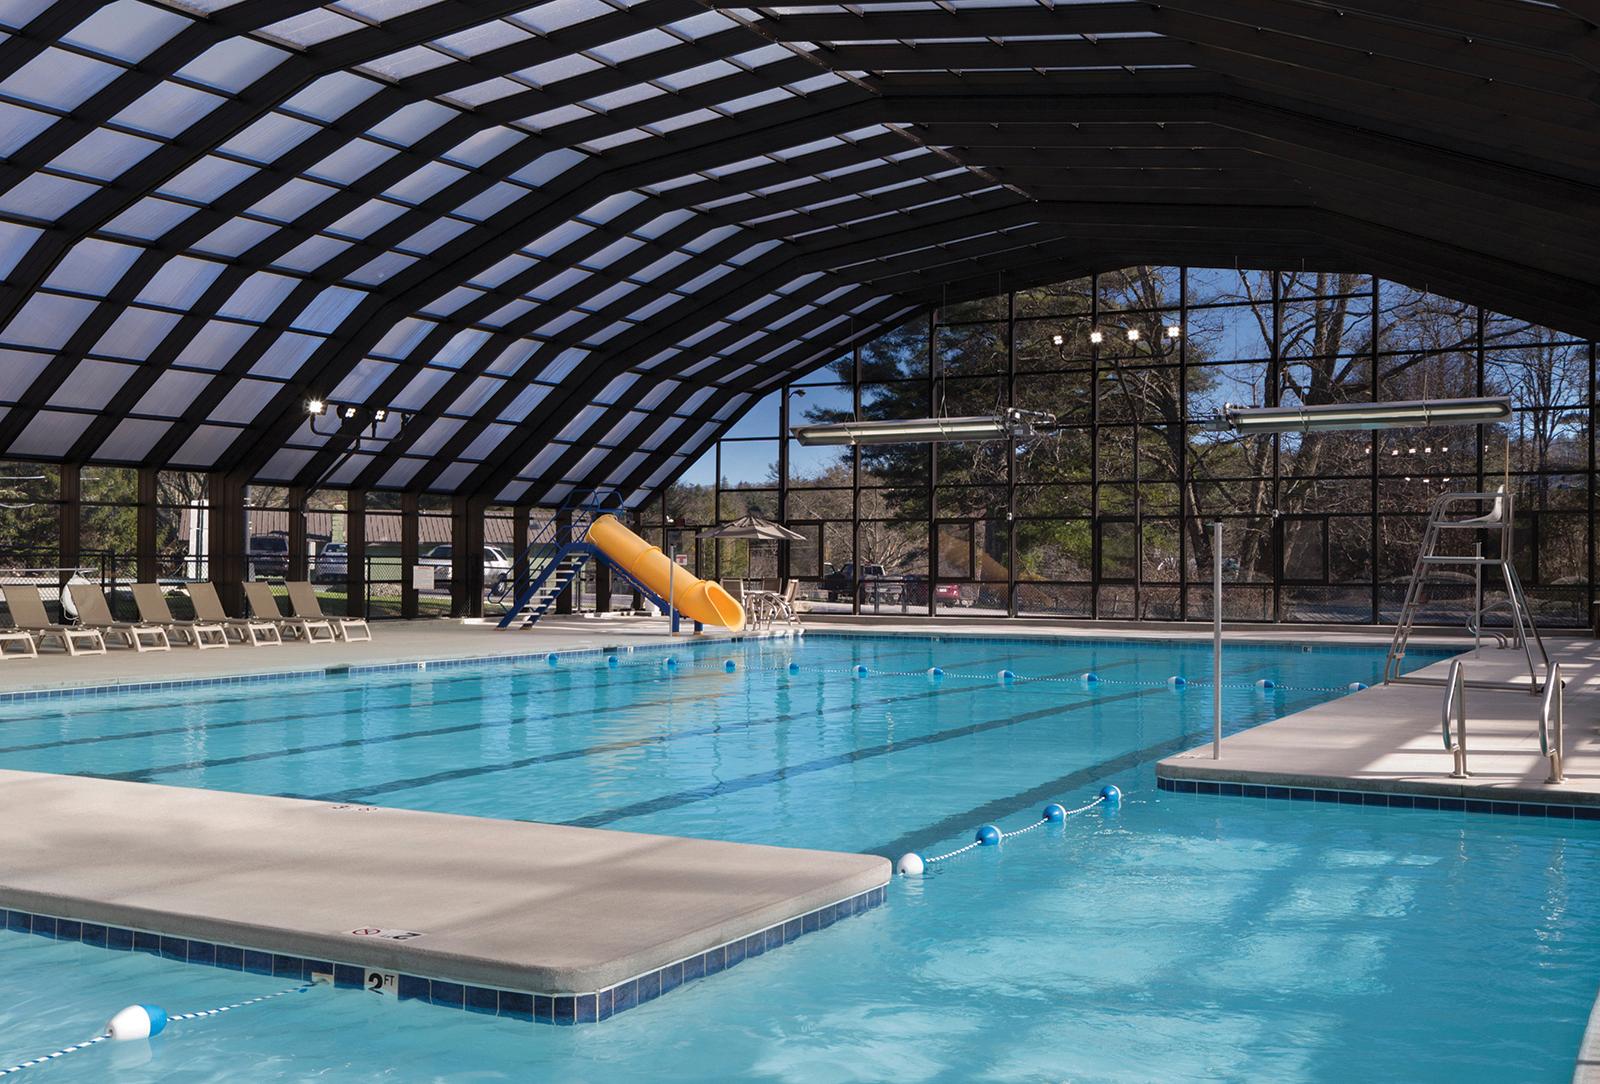 highlands rec park pool north carolina